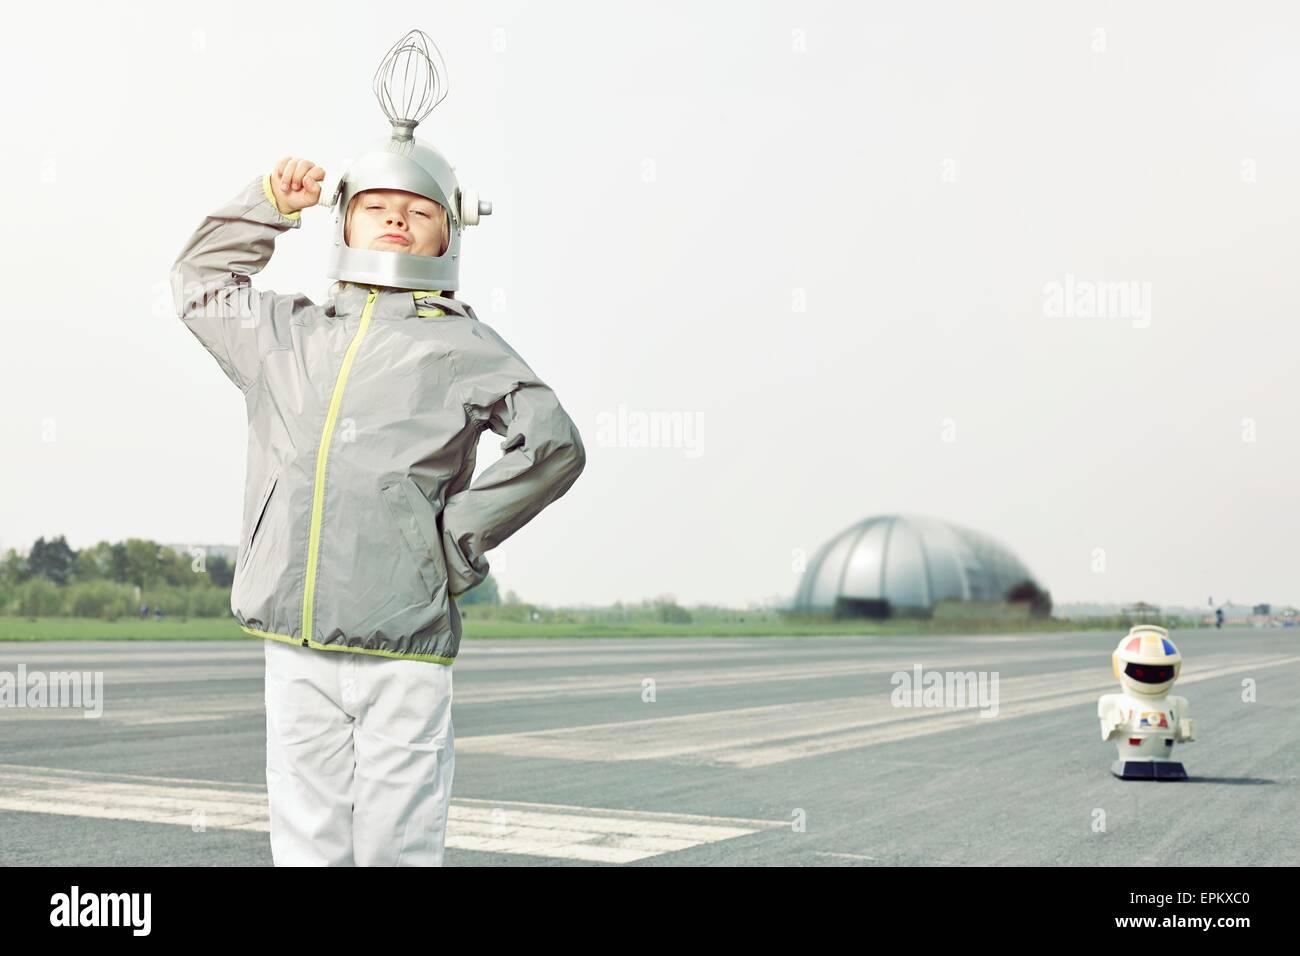 Überzeugt junge verkleidet als Raumfahrer Stockbild